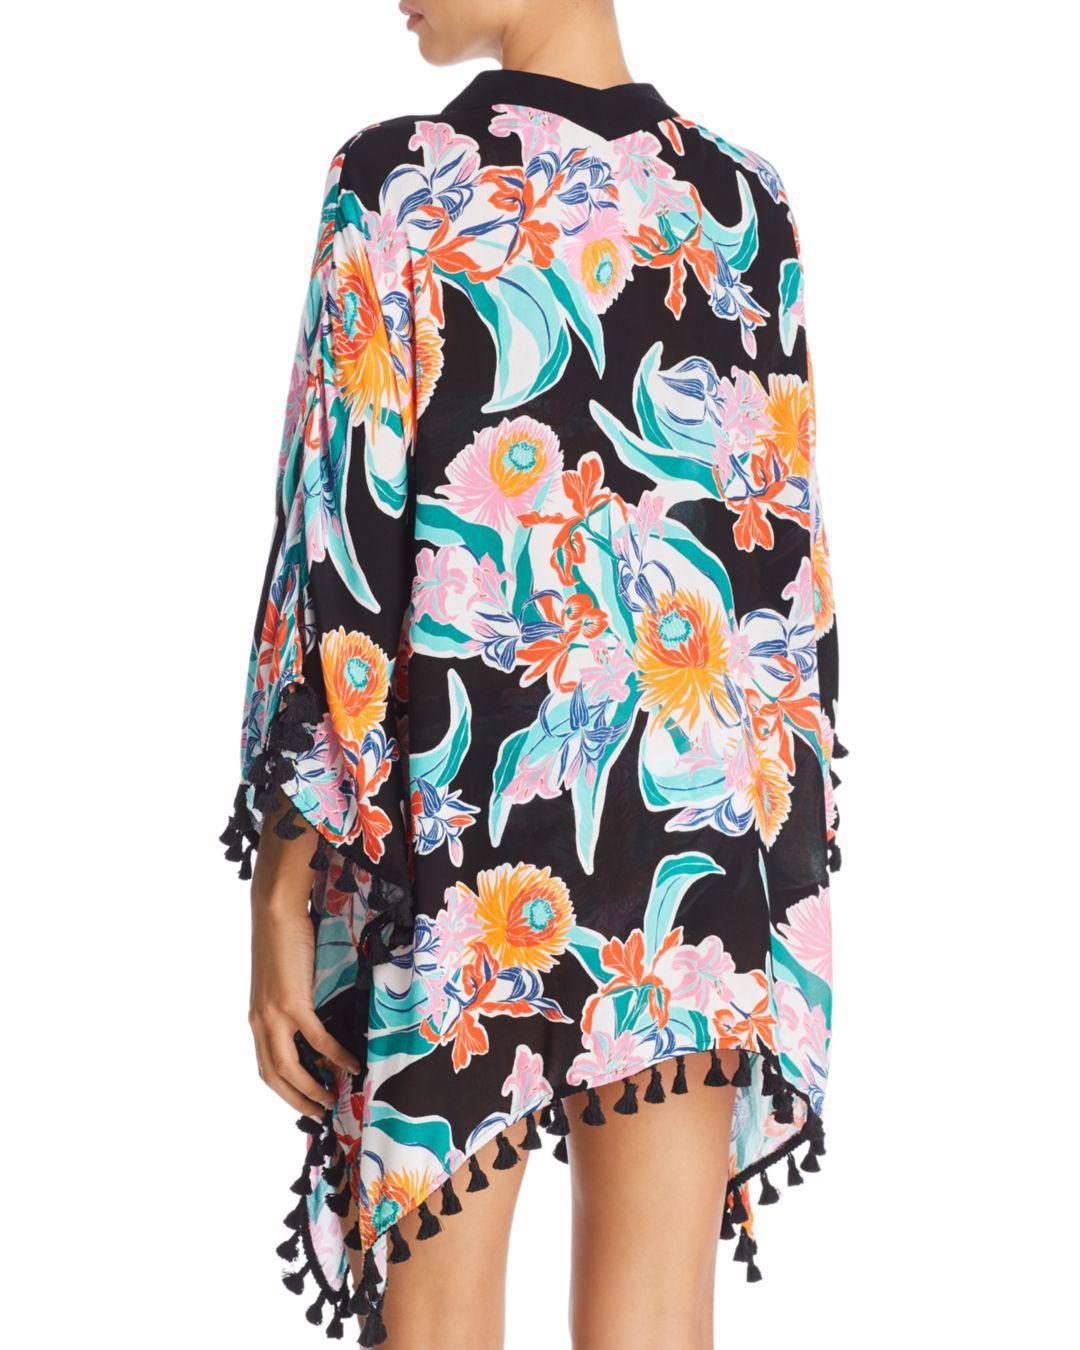 4df8ad041b Lyst - Trina Turk Tropic Wave Kimono Swim Cover-up